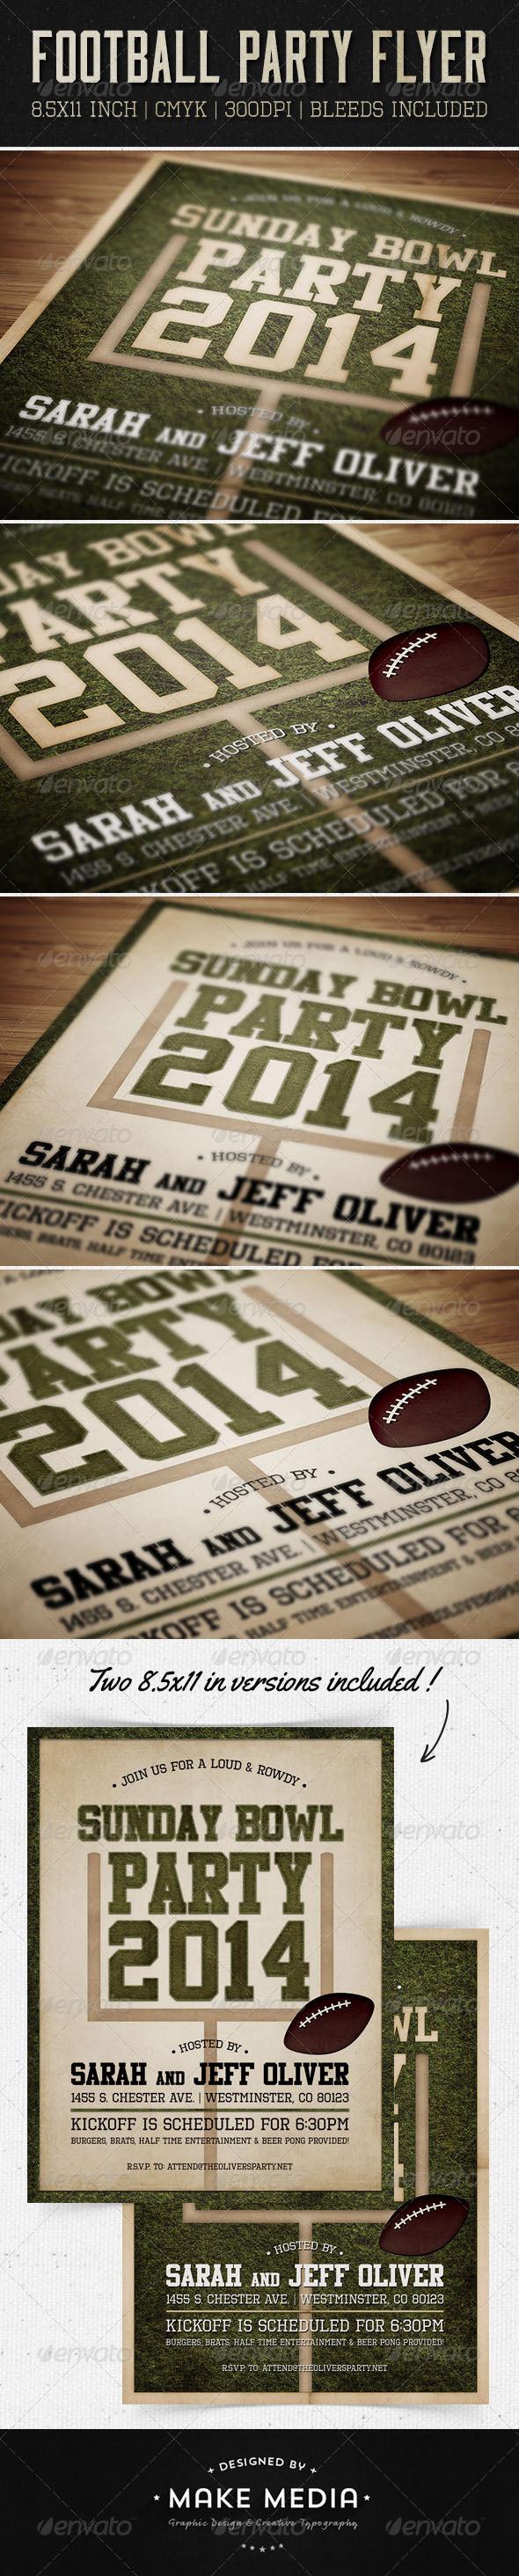 Sunday Bowl Flyer & Invitation - Sports Events